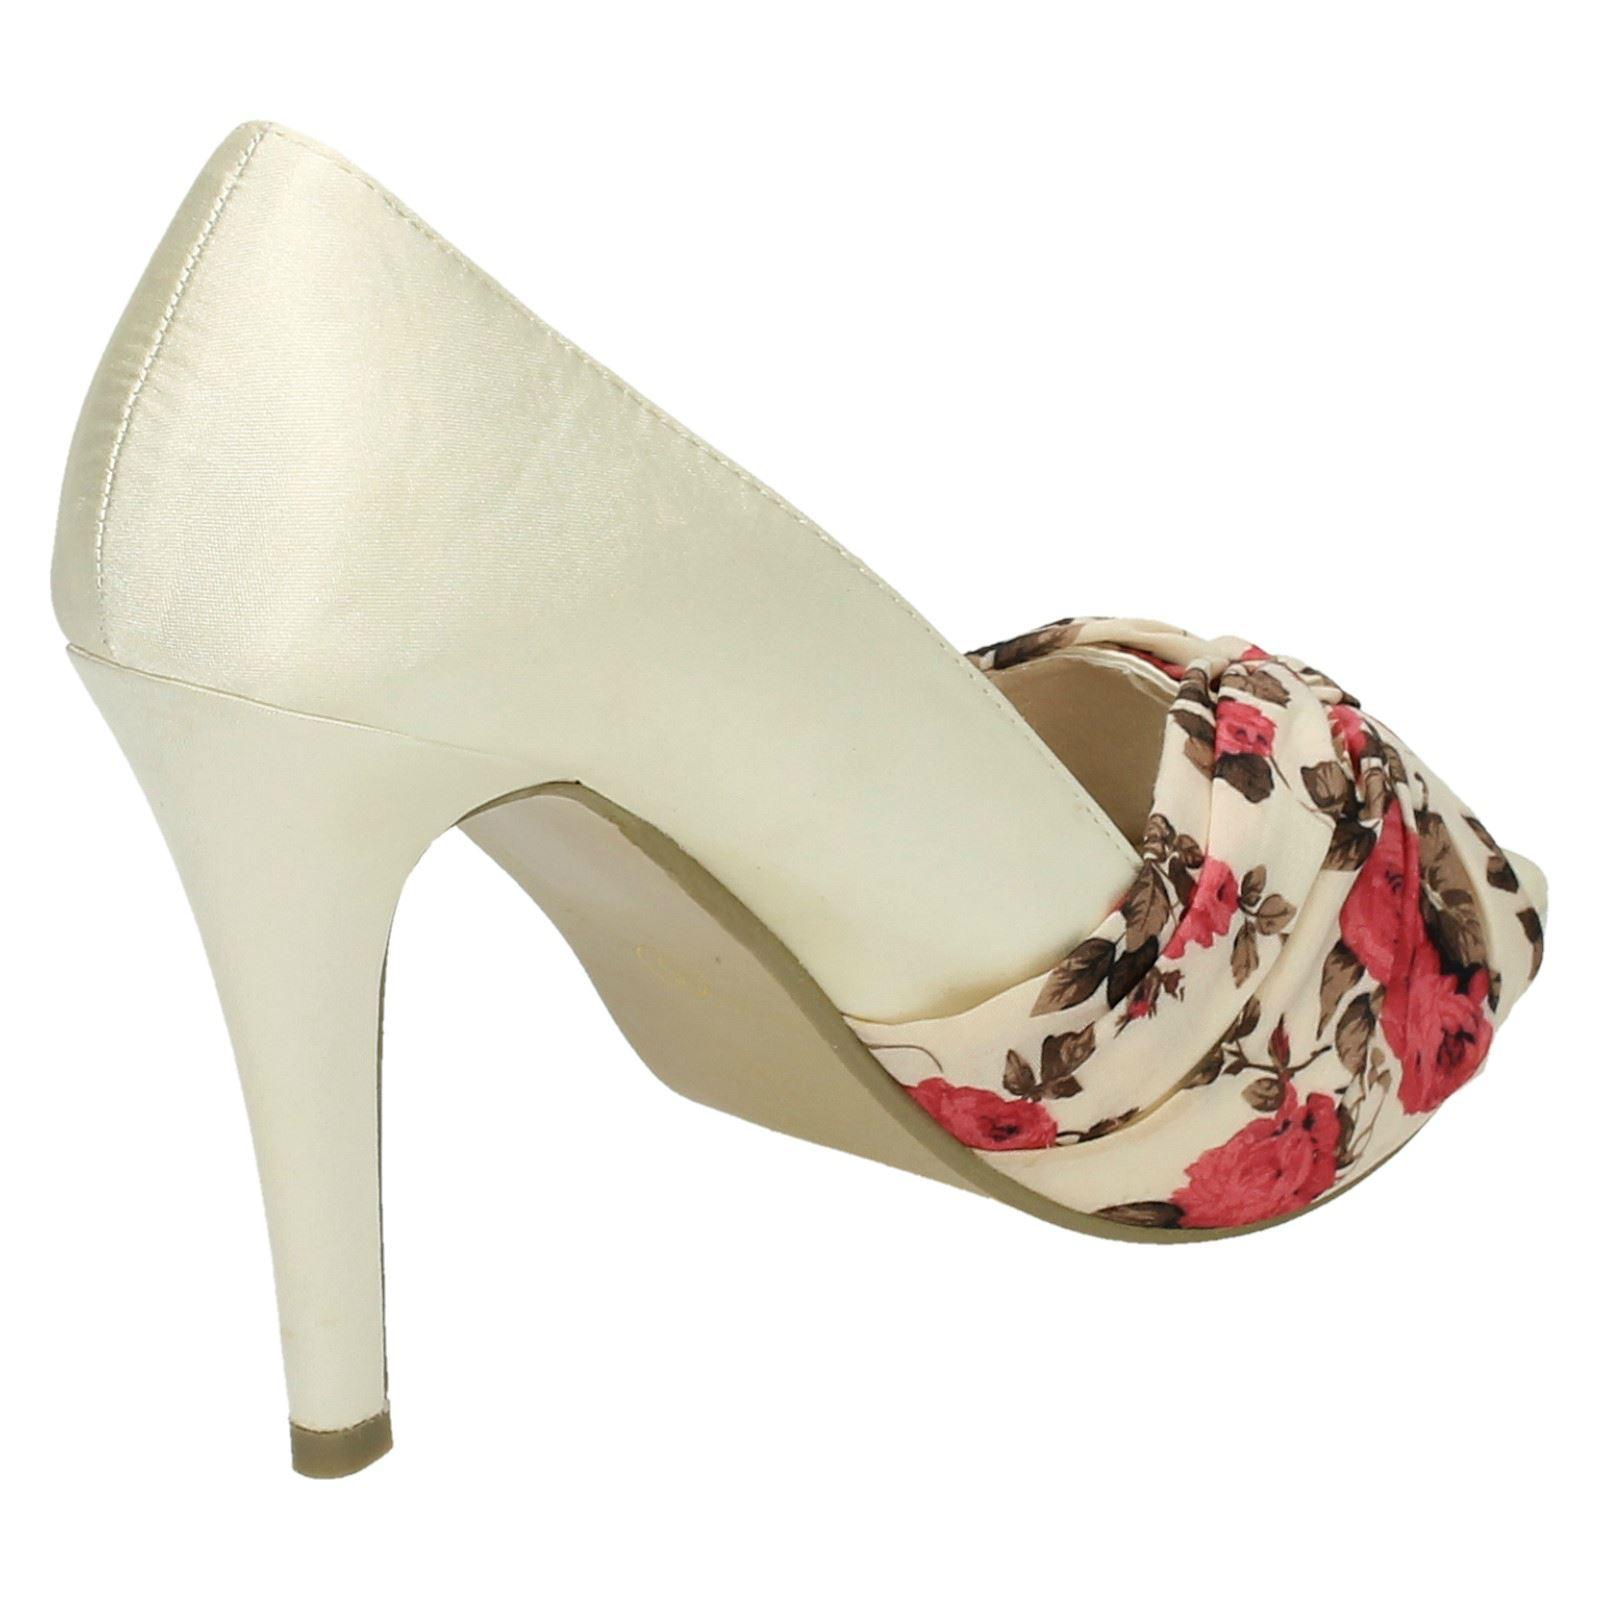 Damas Anne Michelle Floral Tribunal Zapatos Tacón Alto Punta Abierta-L2968